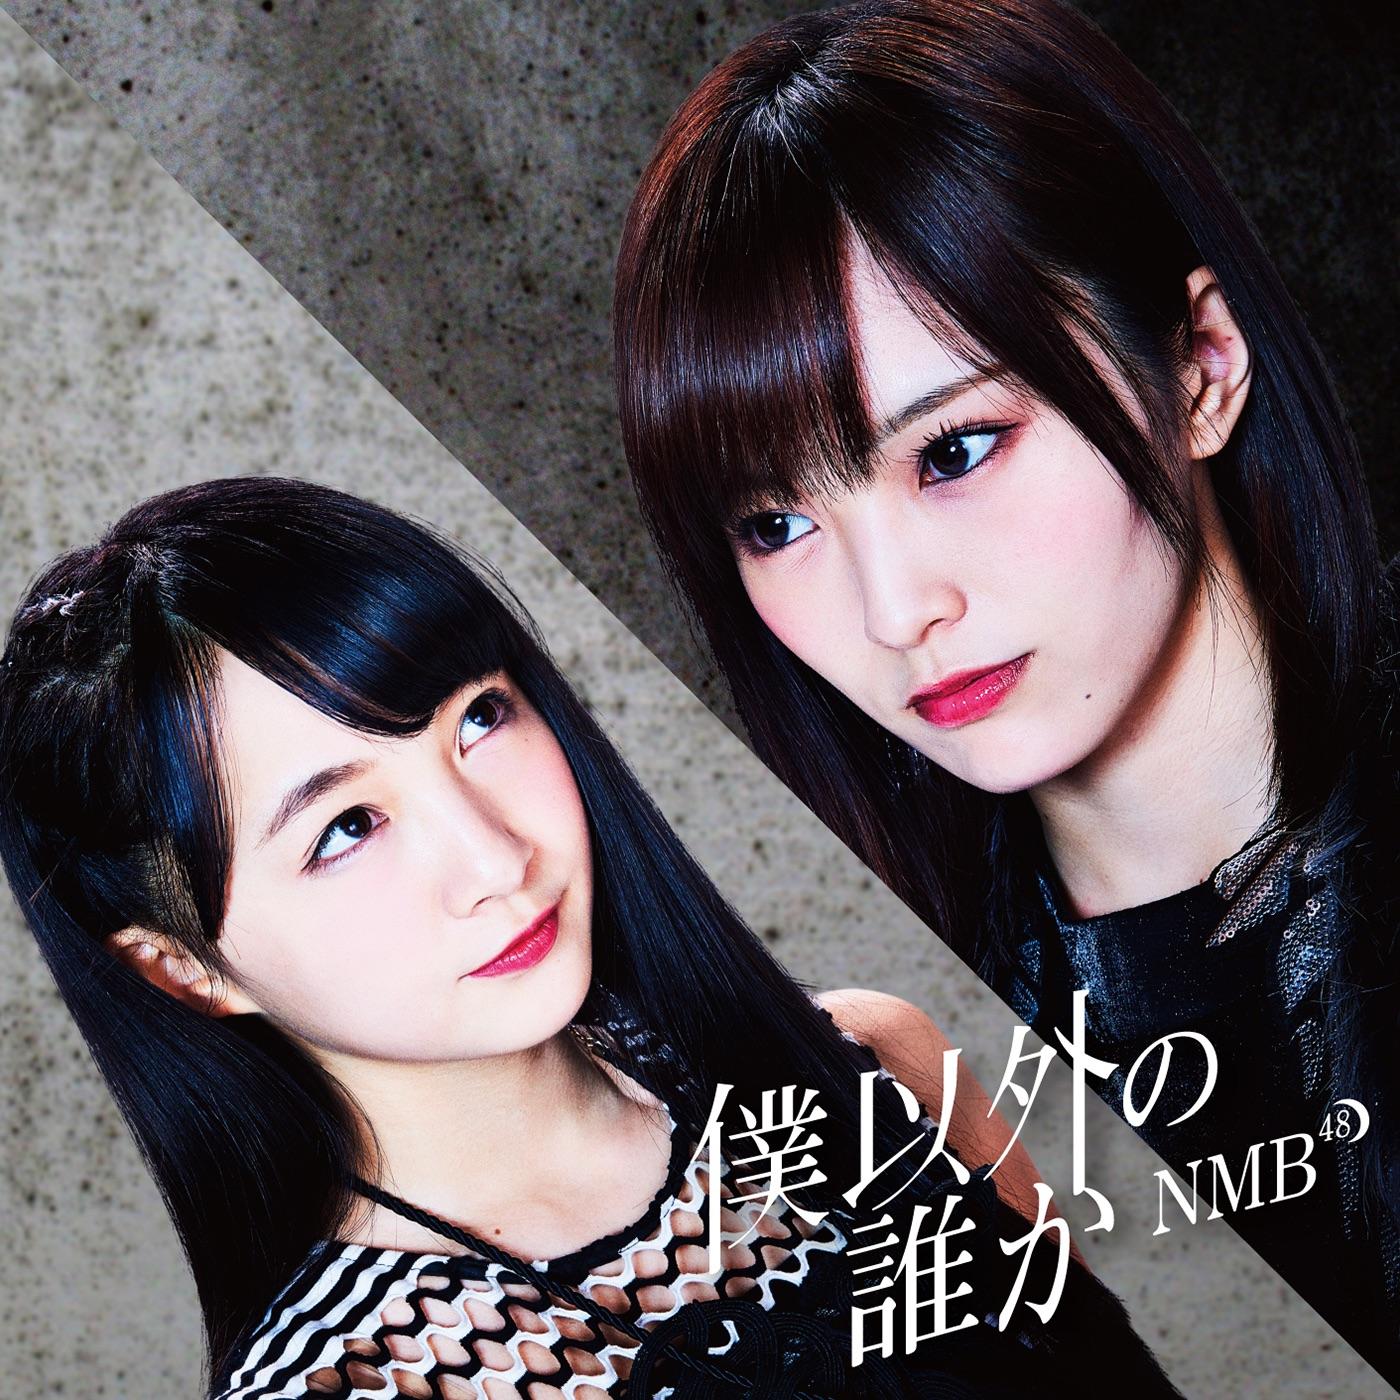 NMB48 - 僕以外の誰か (劇場盤) - EP